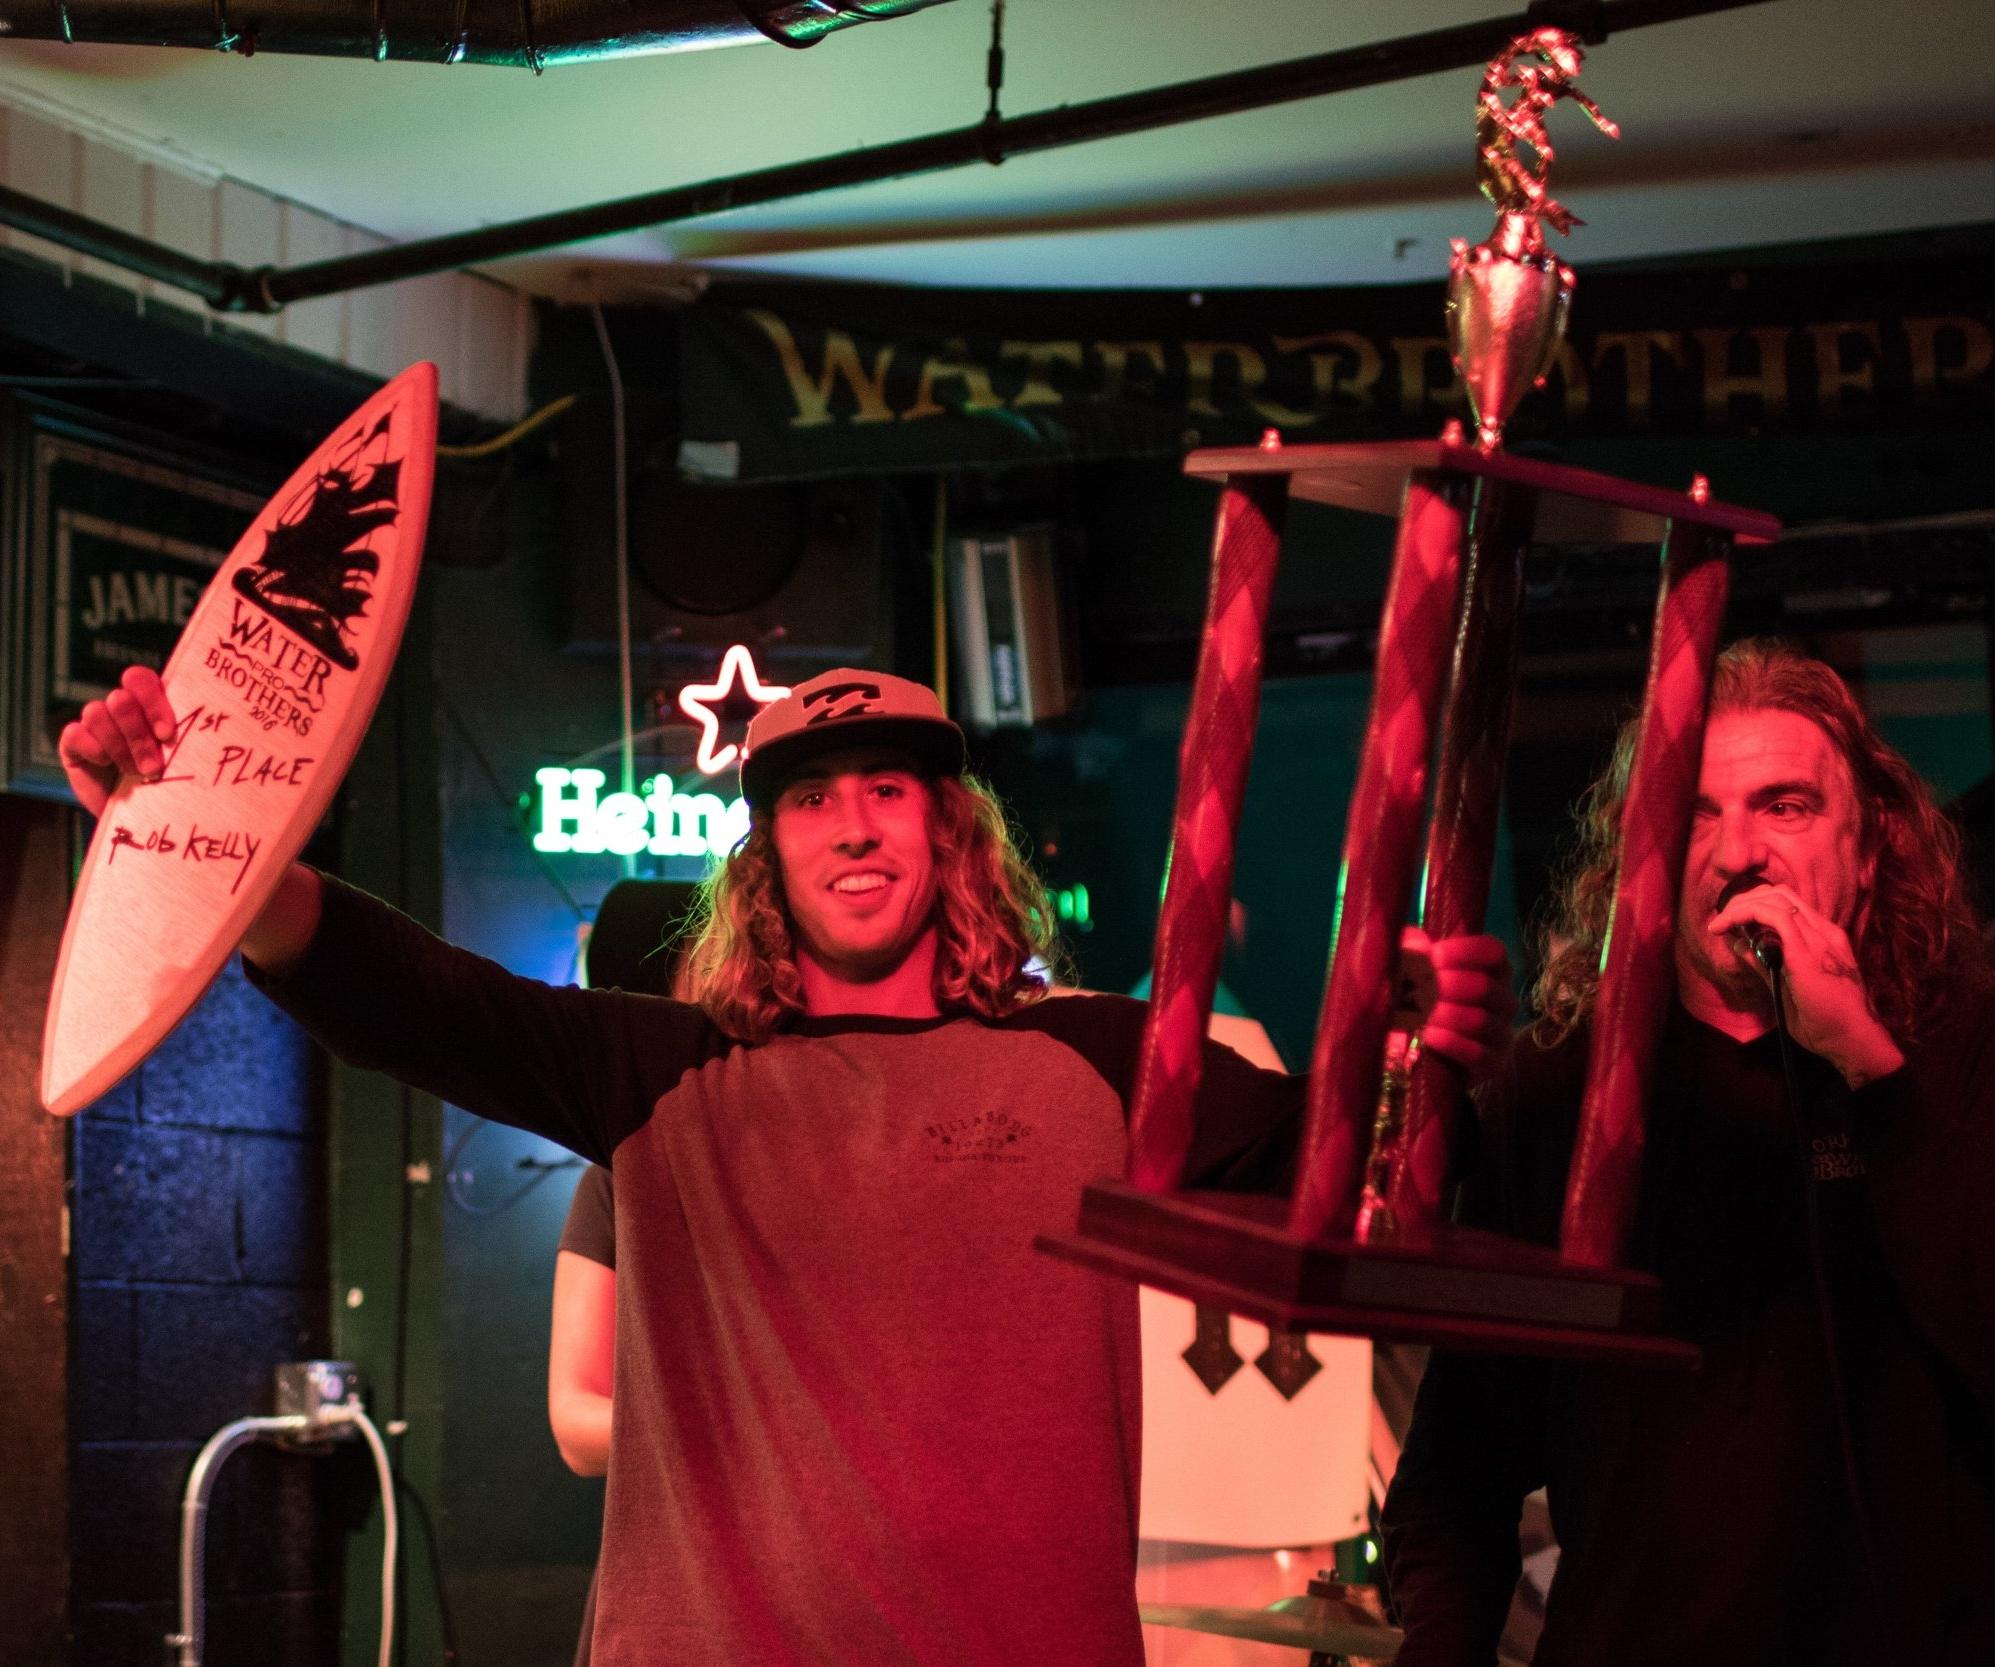 Winner, Rob Kelly photo: Patrick Murphy , The Kings Lens